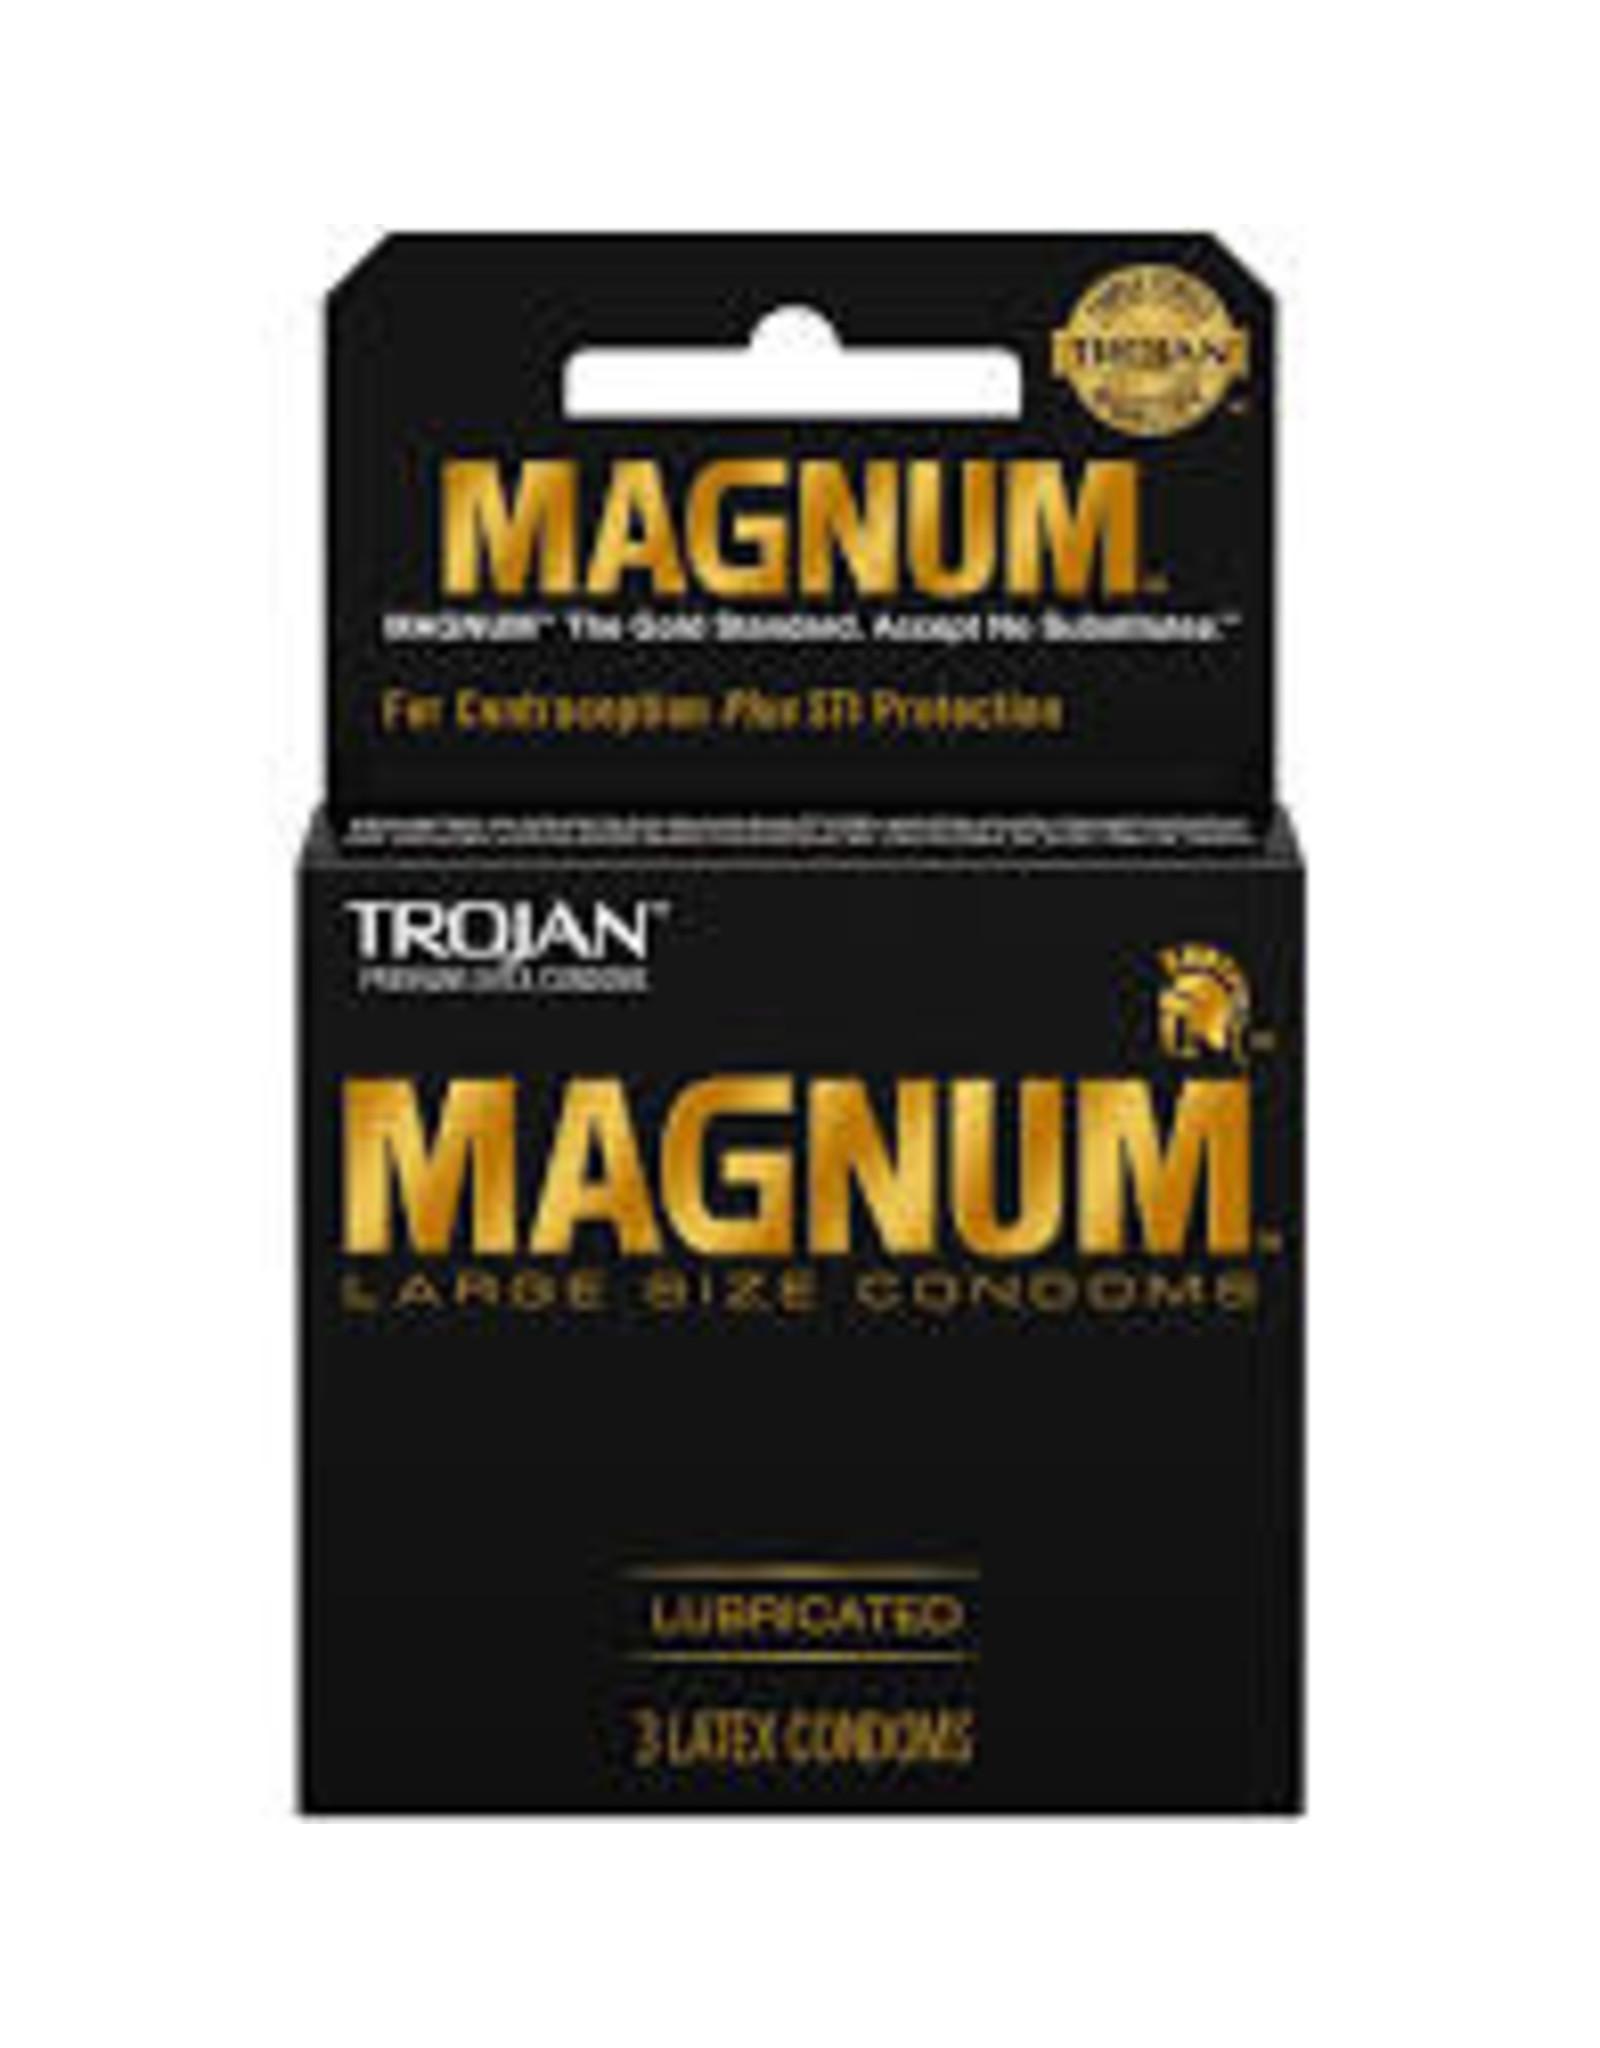 Trojan Magnum Large Size Condoms Single